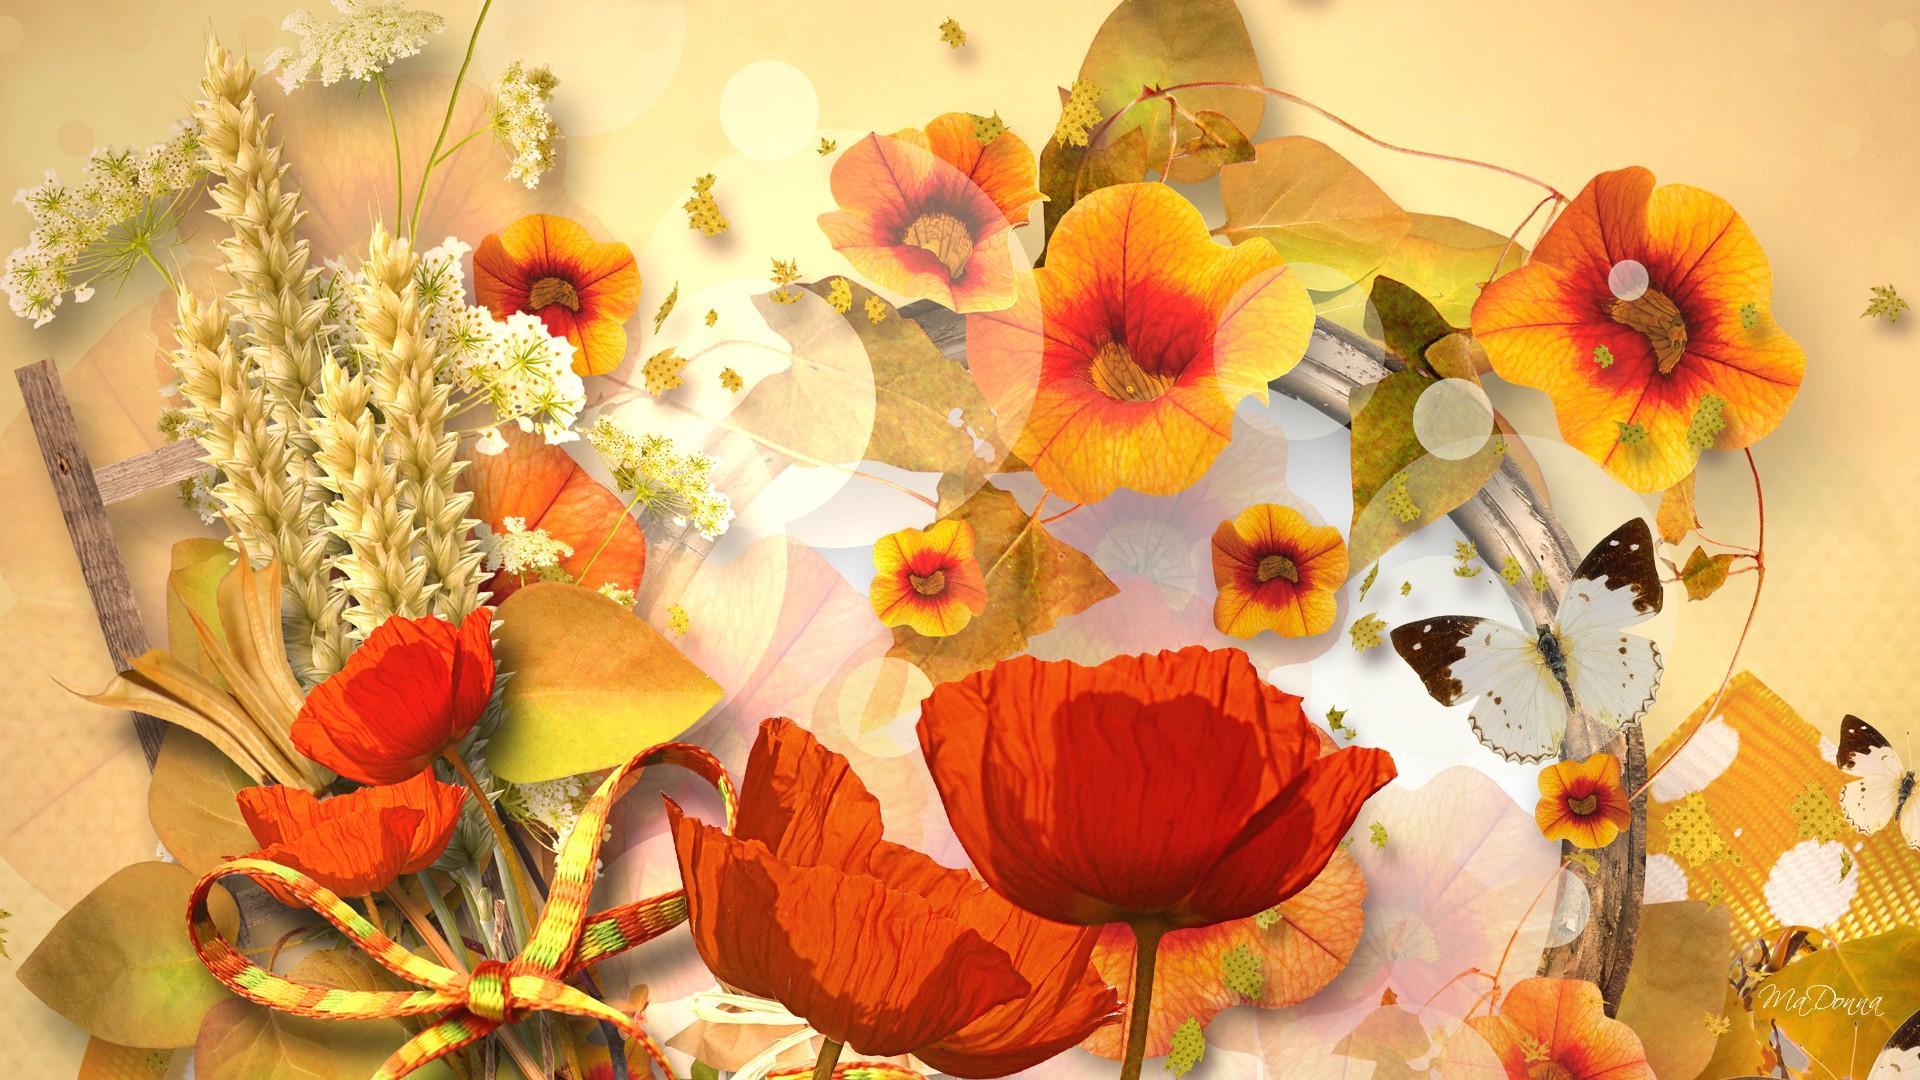 1920x1080px fall flowers wallpaper - wallpapersafari